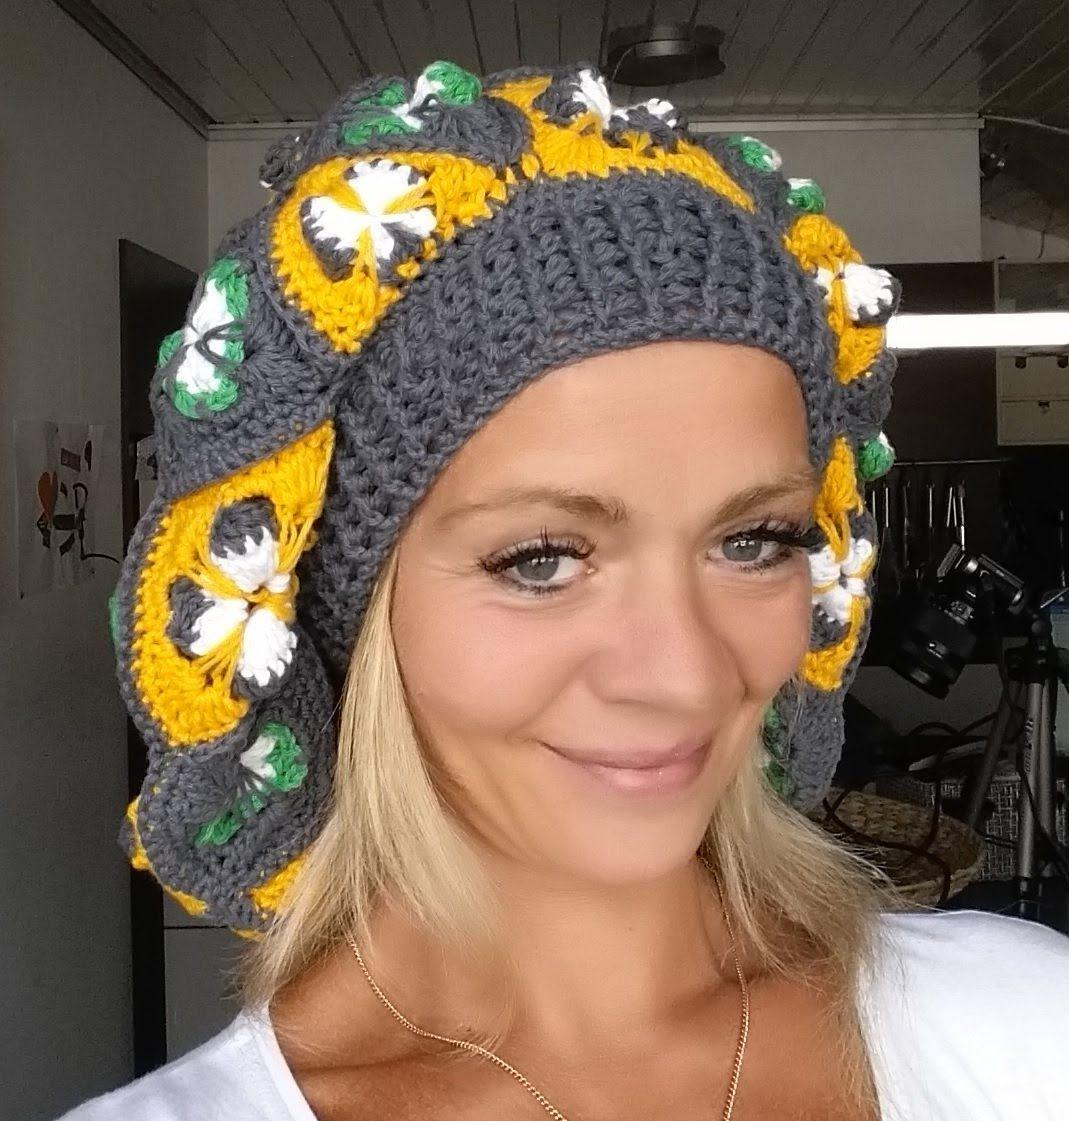 Crochet Ballon Mütze Sophie Teil 1# Häkeln mit Yve | videa ...